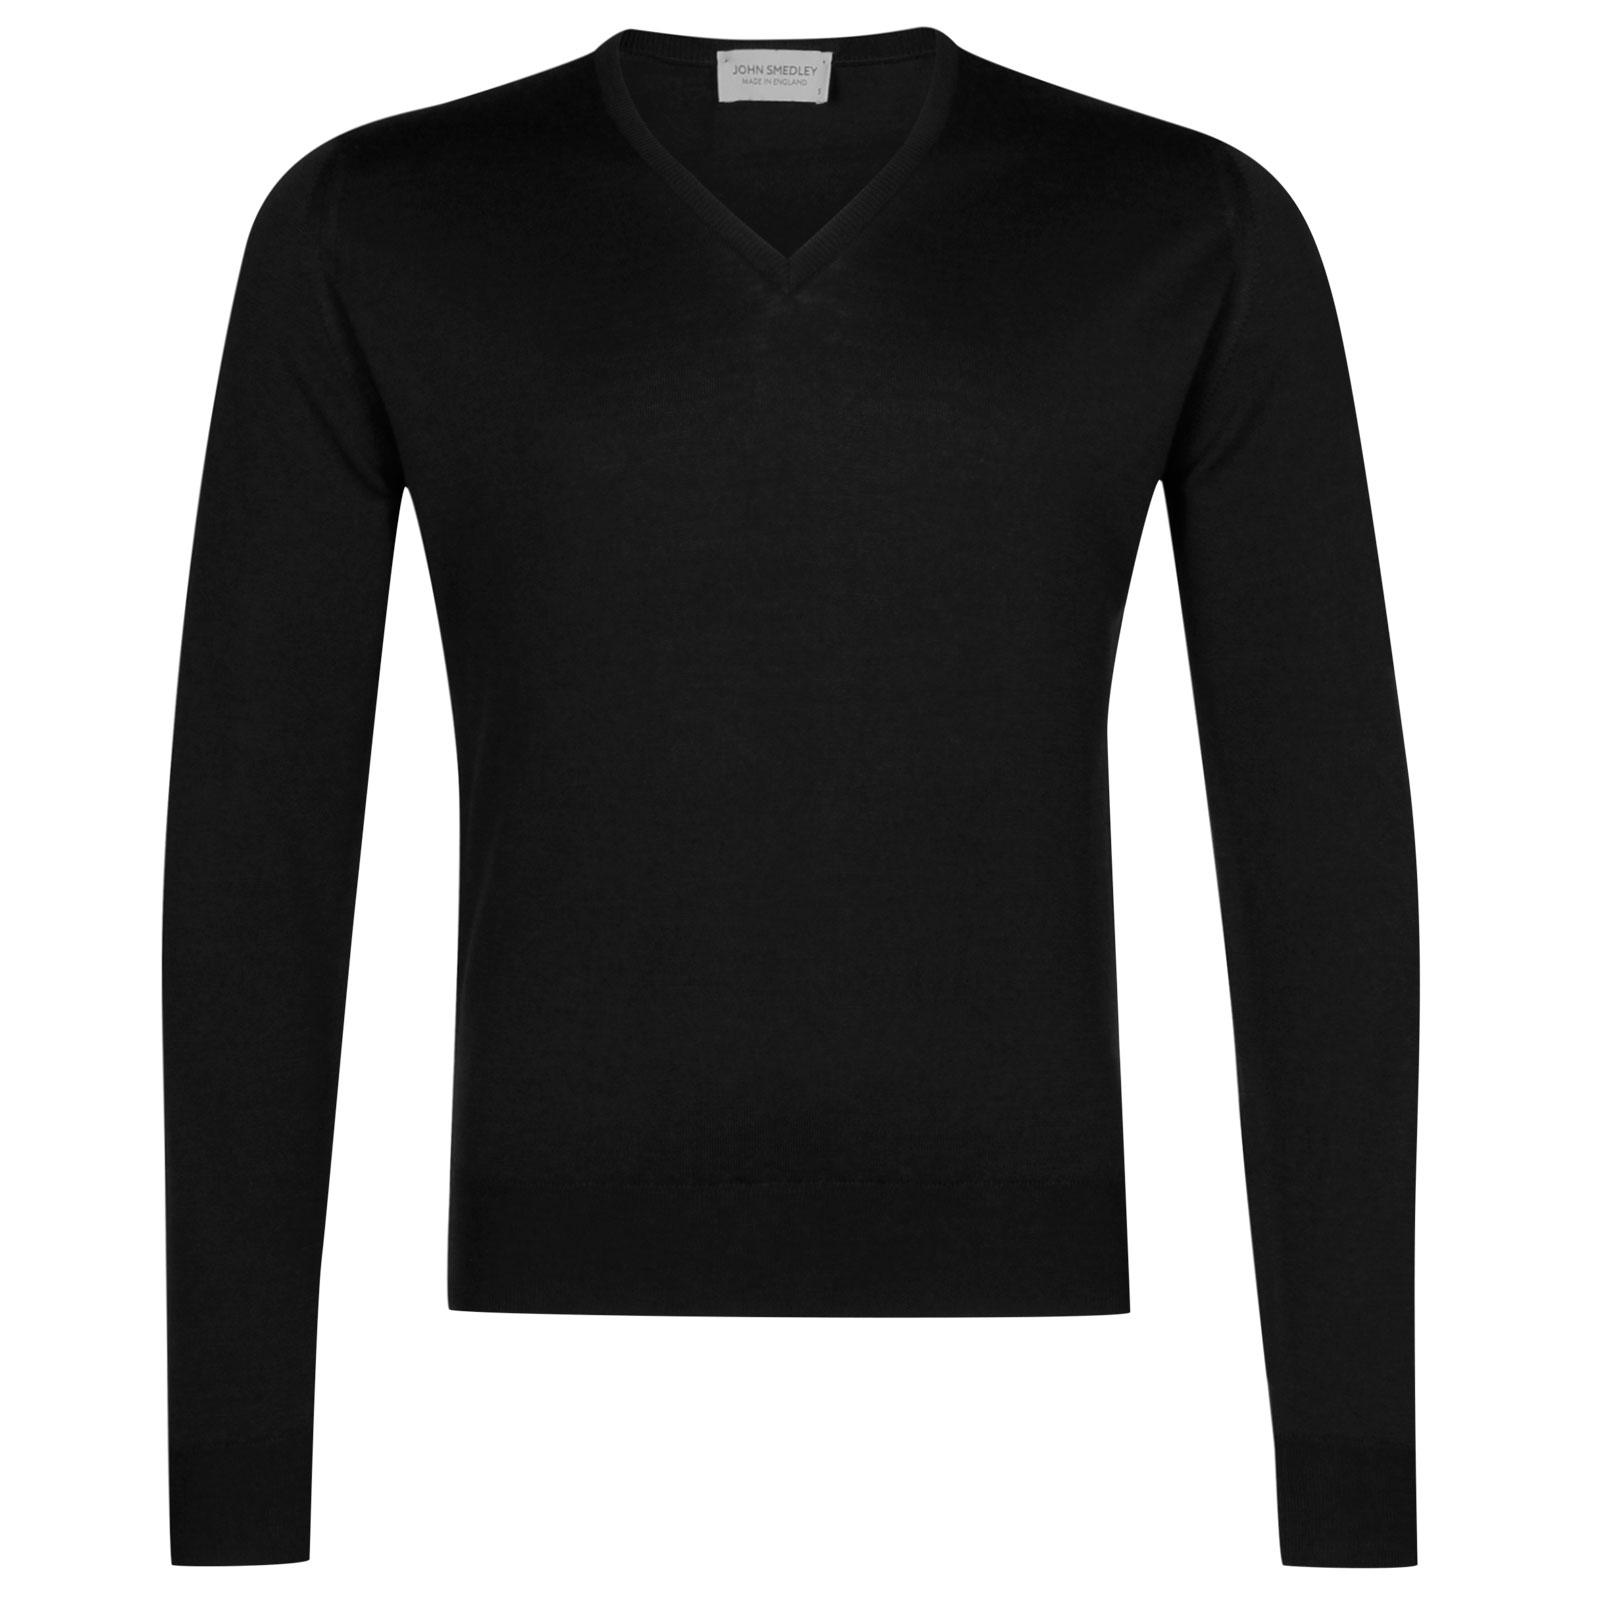 John Smedley Lugano Merino Wool Pullover in Black-M